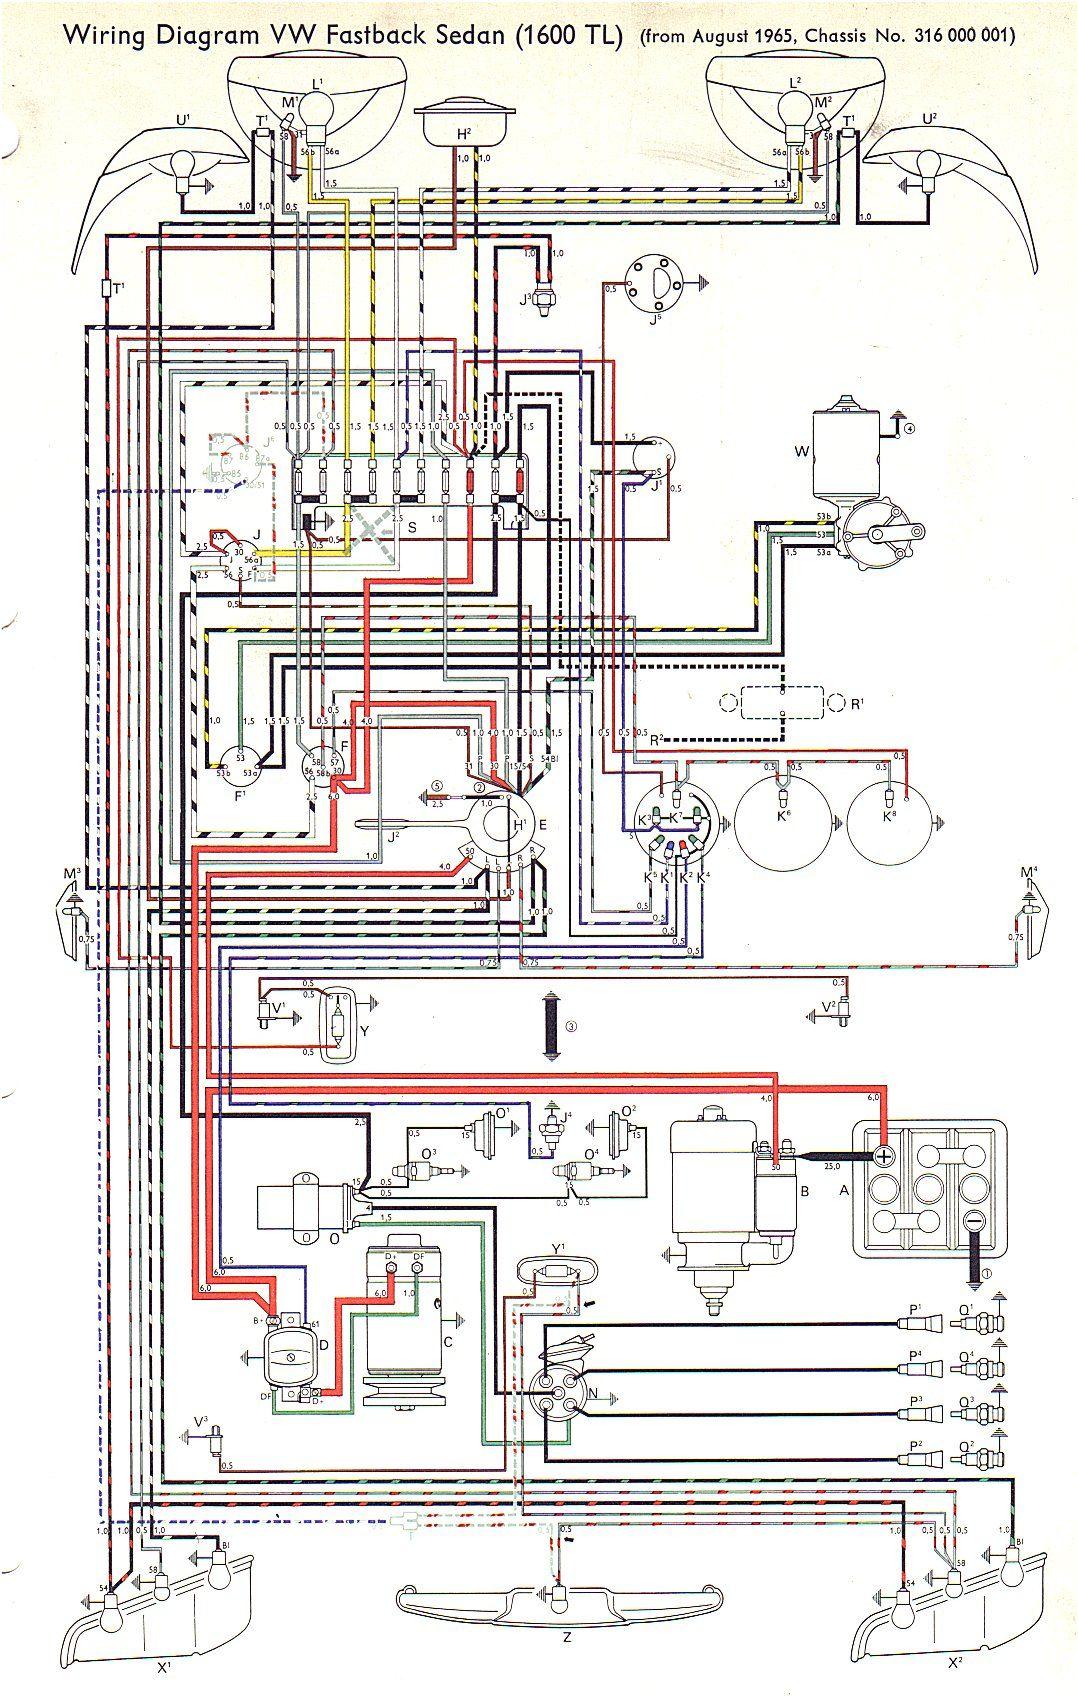 medium resolution of vw type 3 wiring diagrams in vw diagram in 2003 vw passat wiring diagram